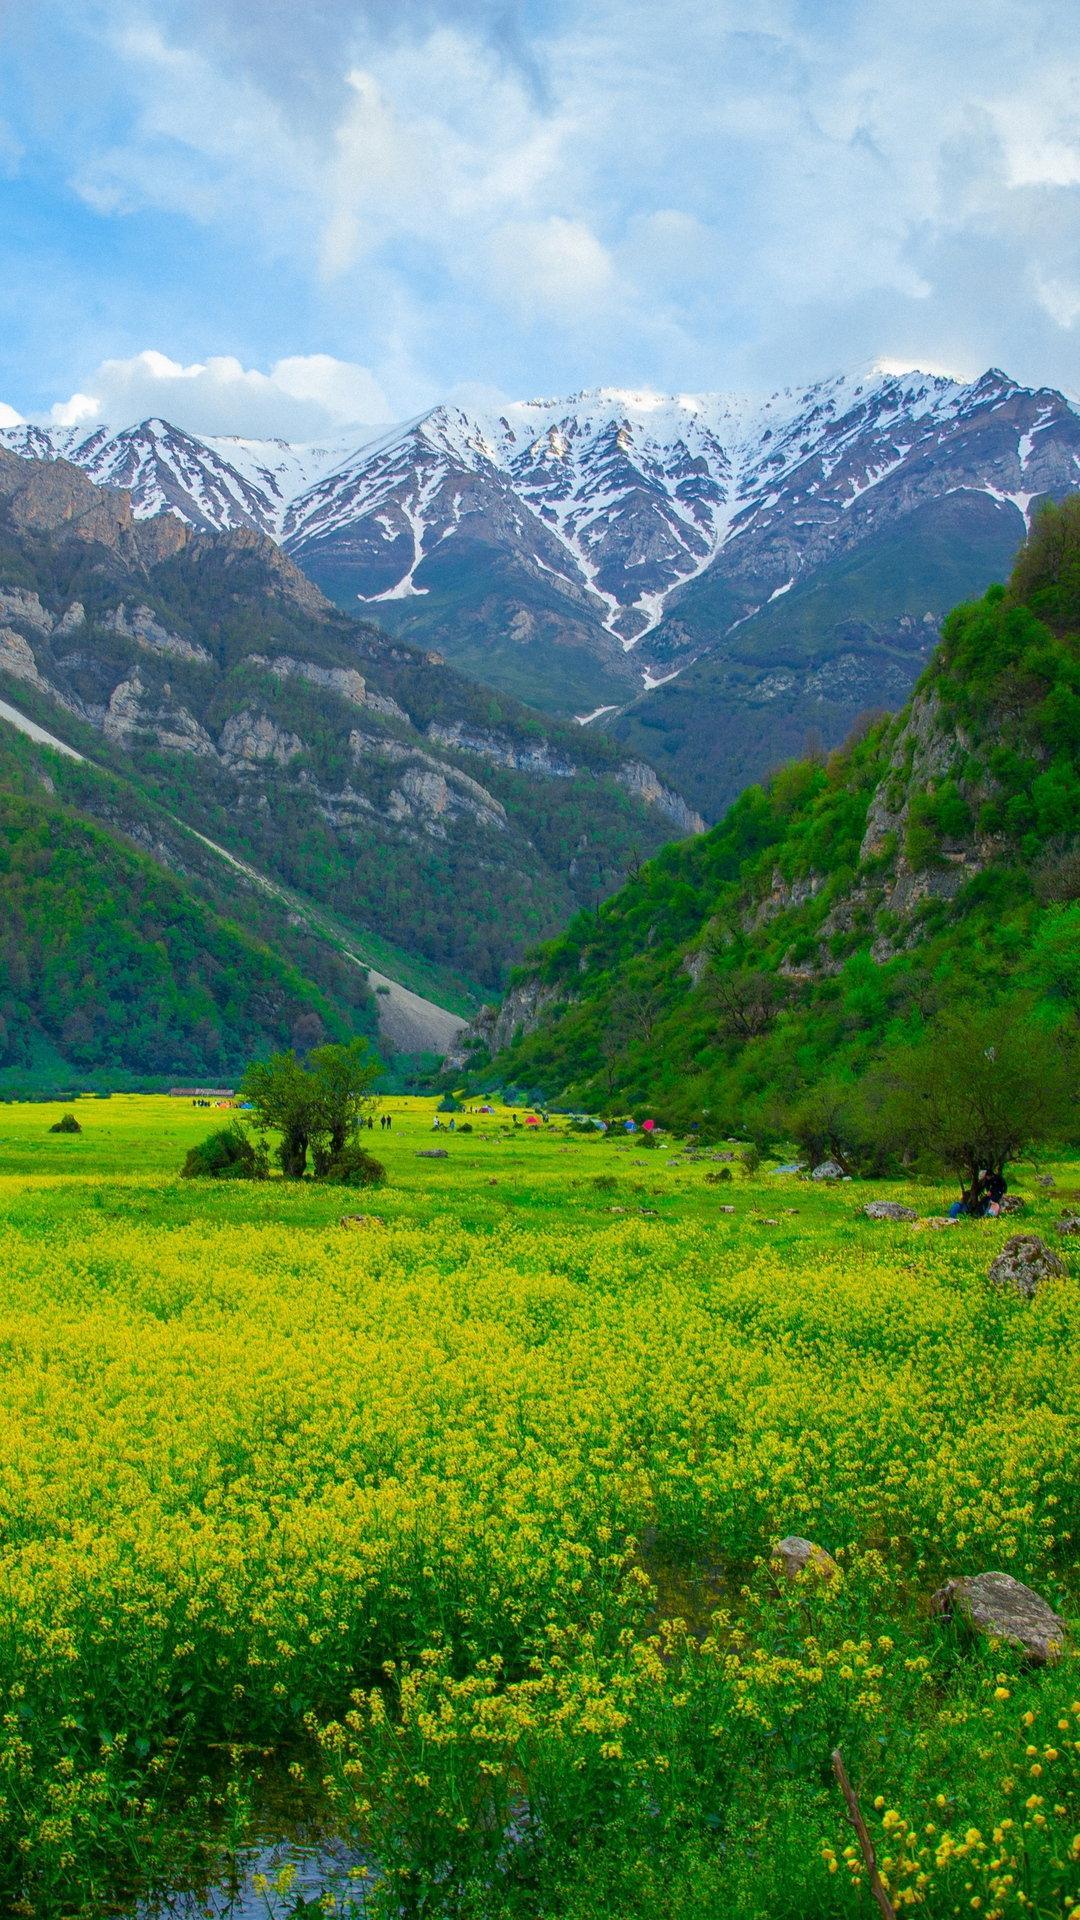 Meadow Mountains Flowers Wallpaper